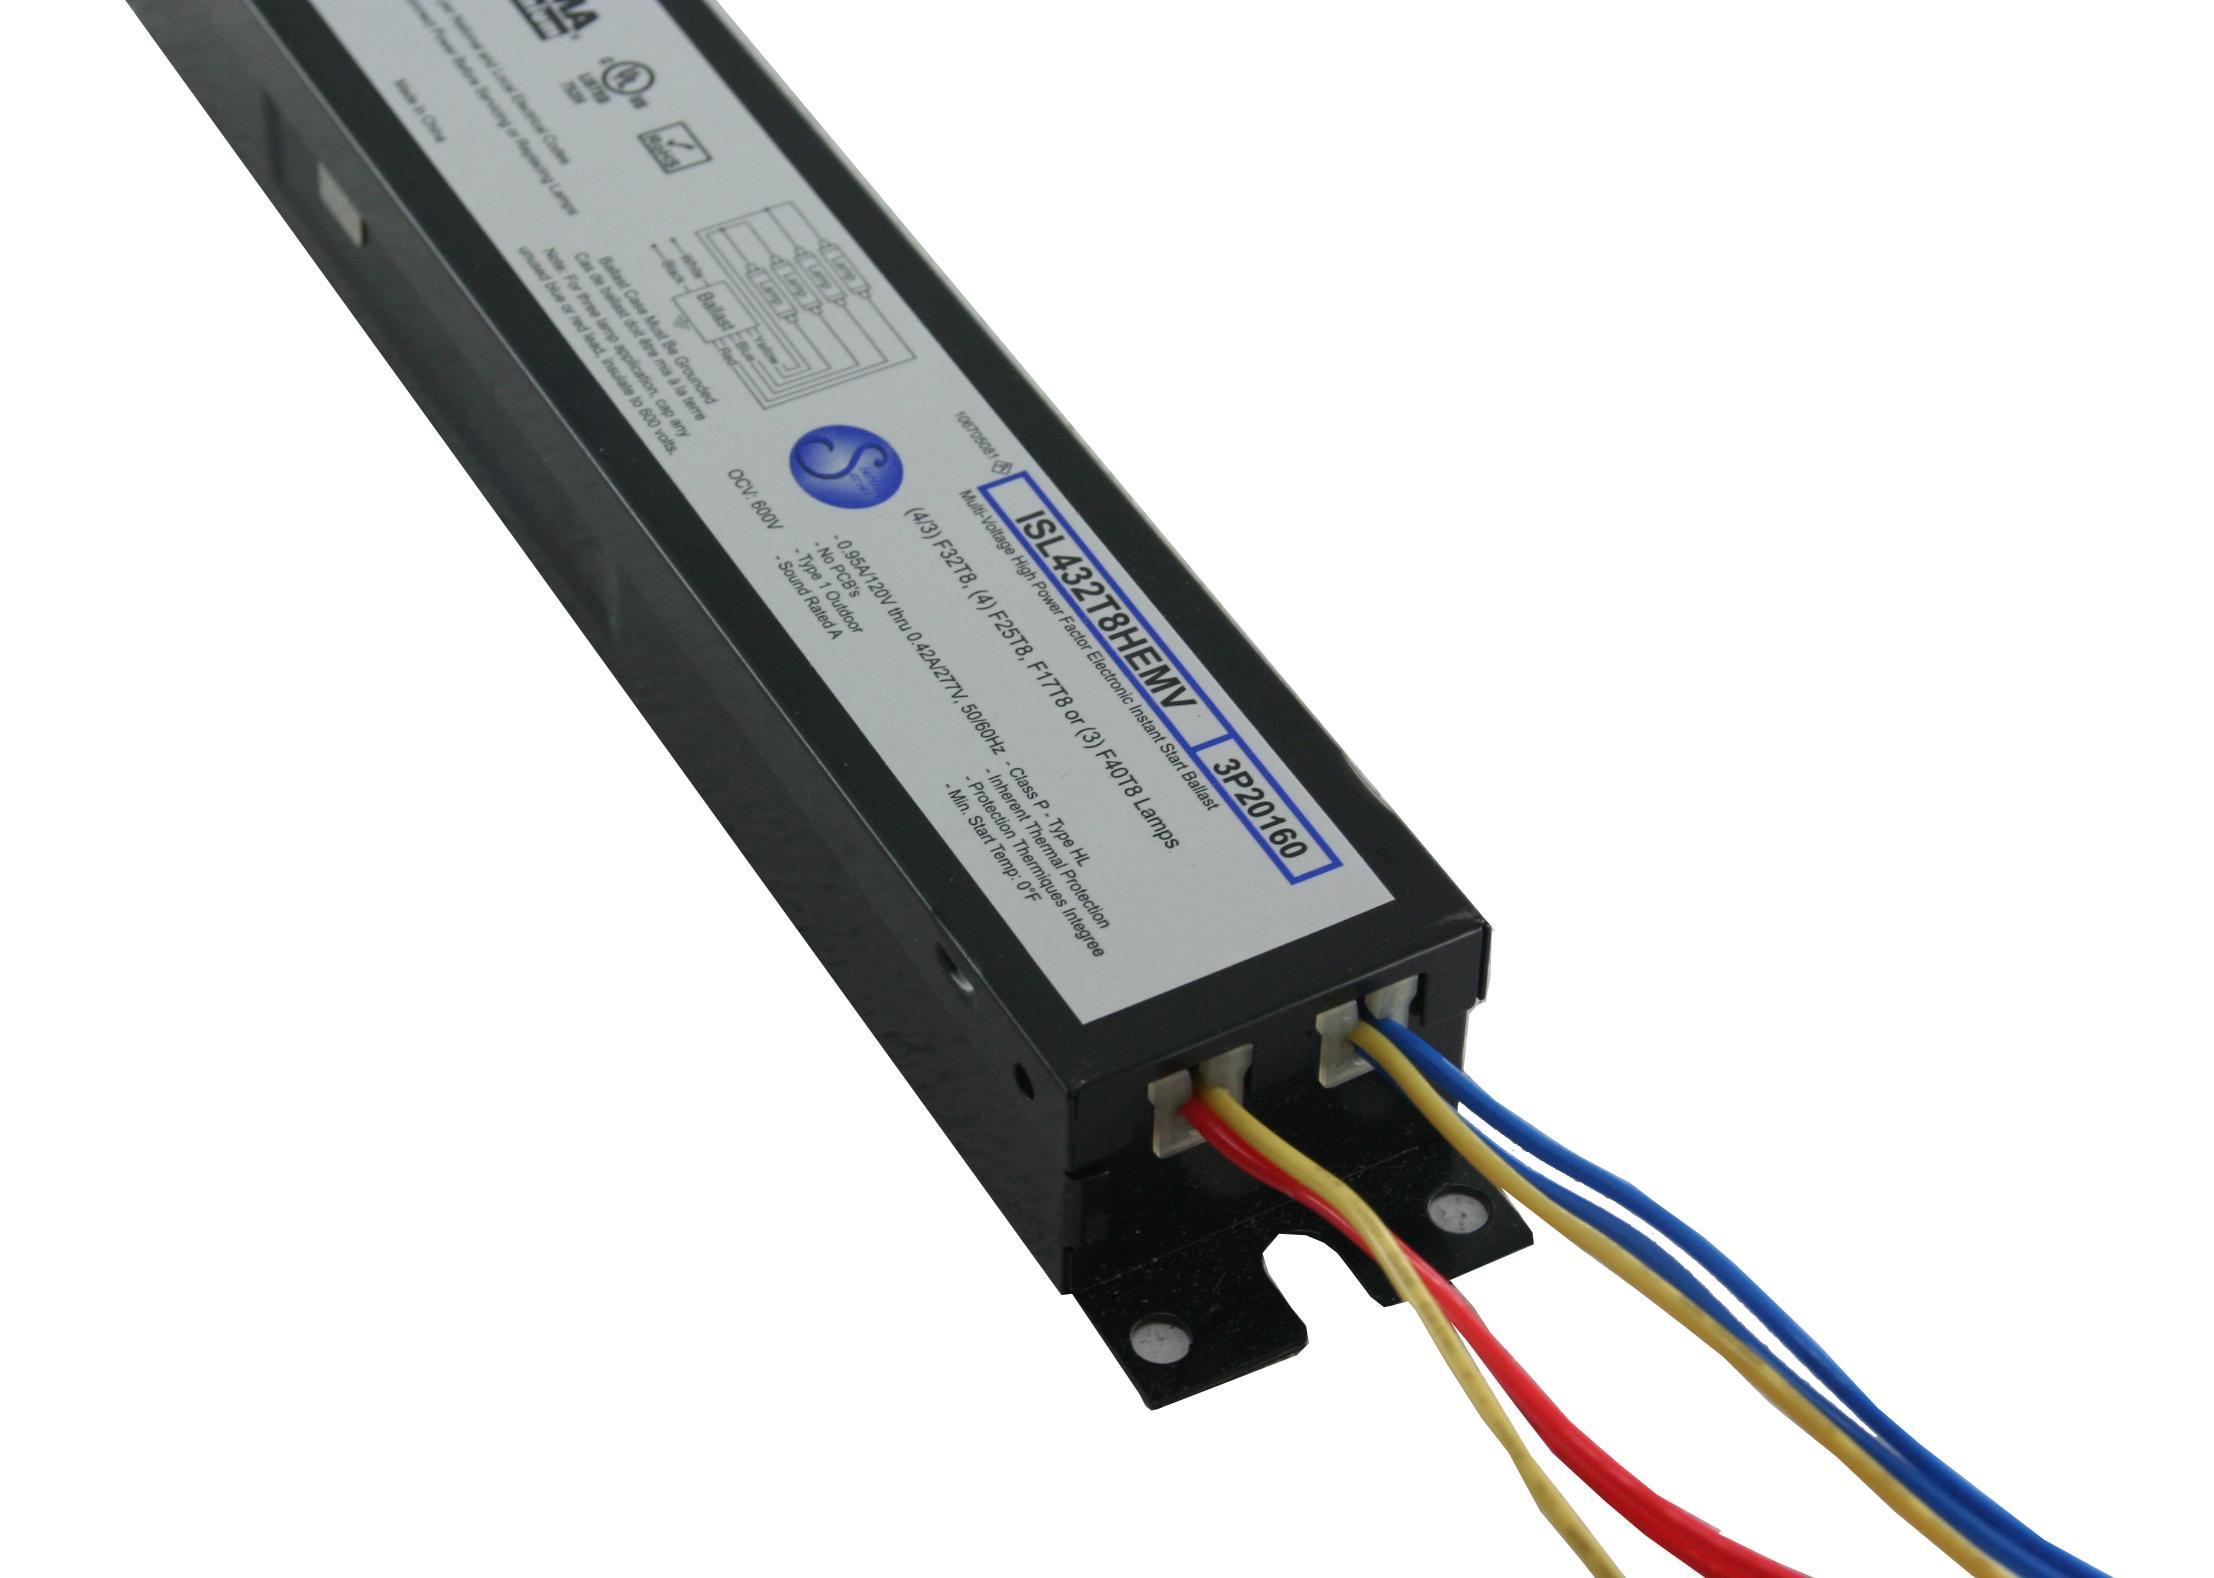 Fulham Electronic Ballast Wiring Diagram Schematics Data Workhorse 4 L T5 Circuit Maker 2 34e